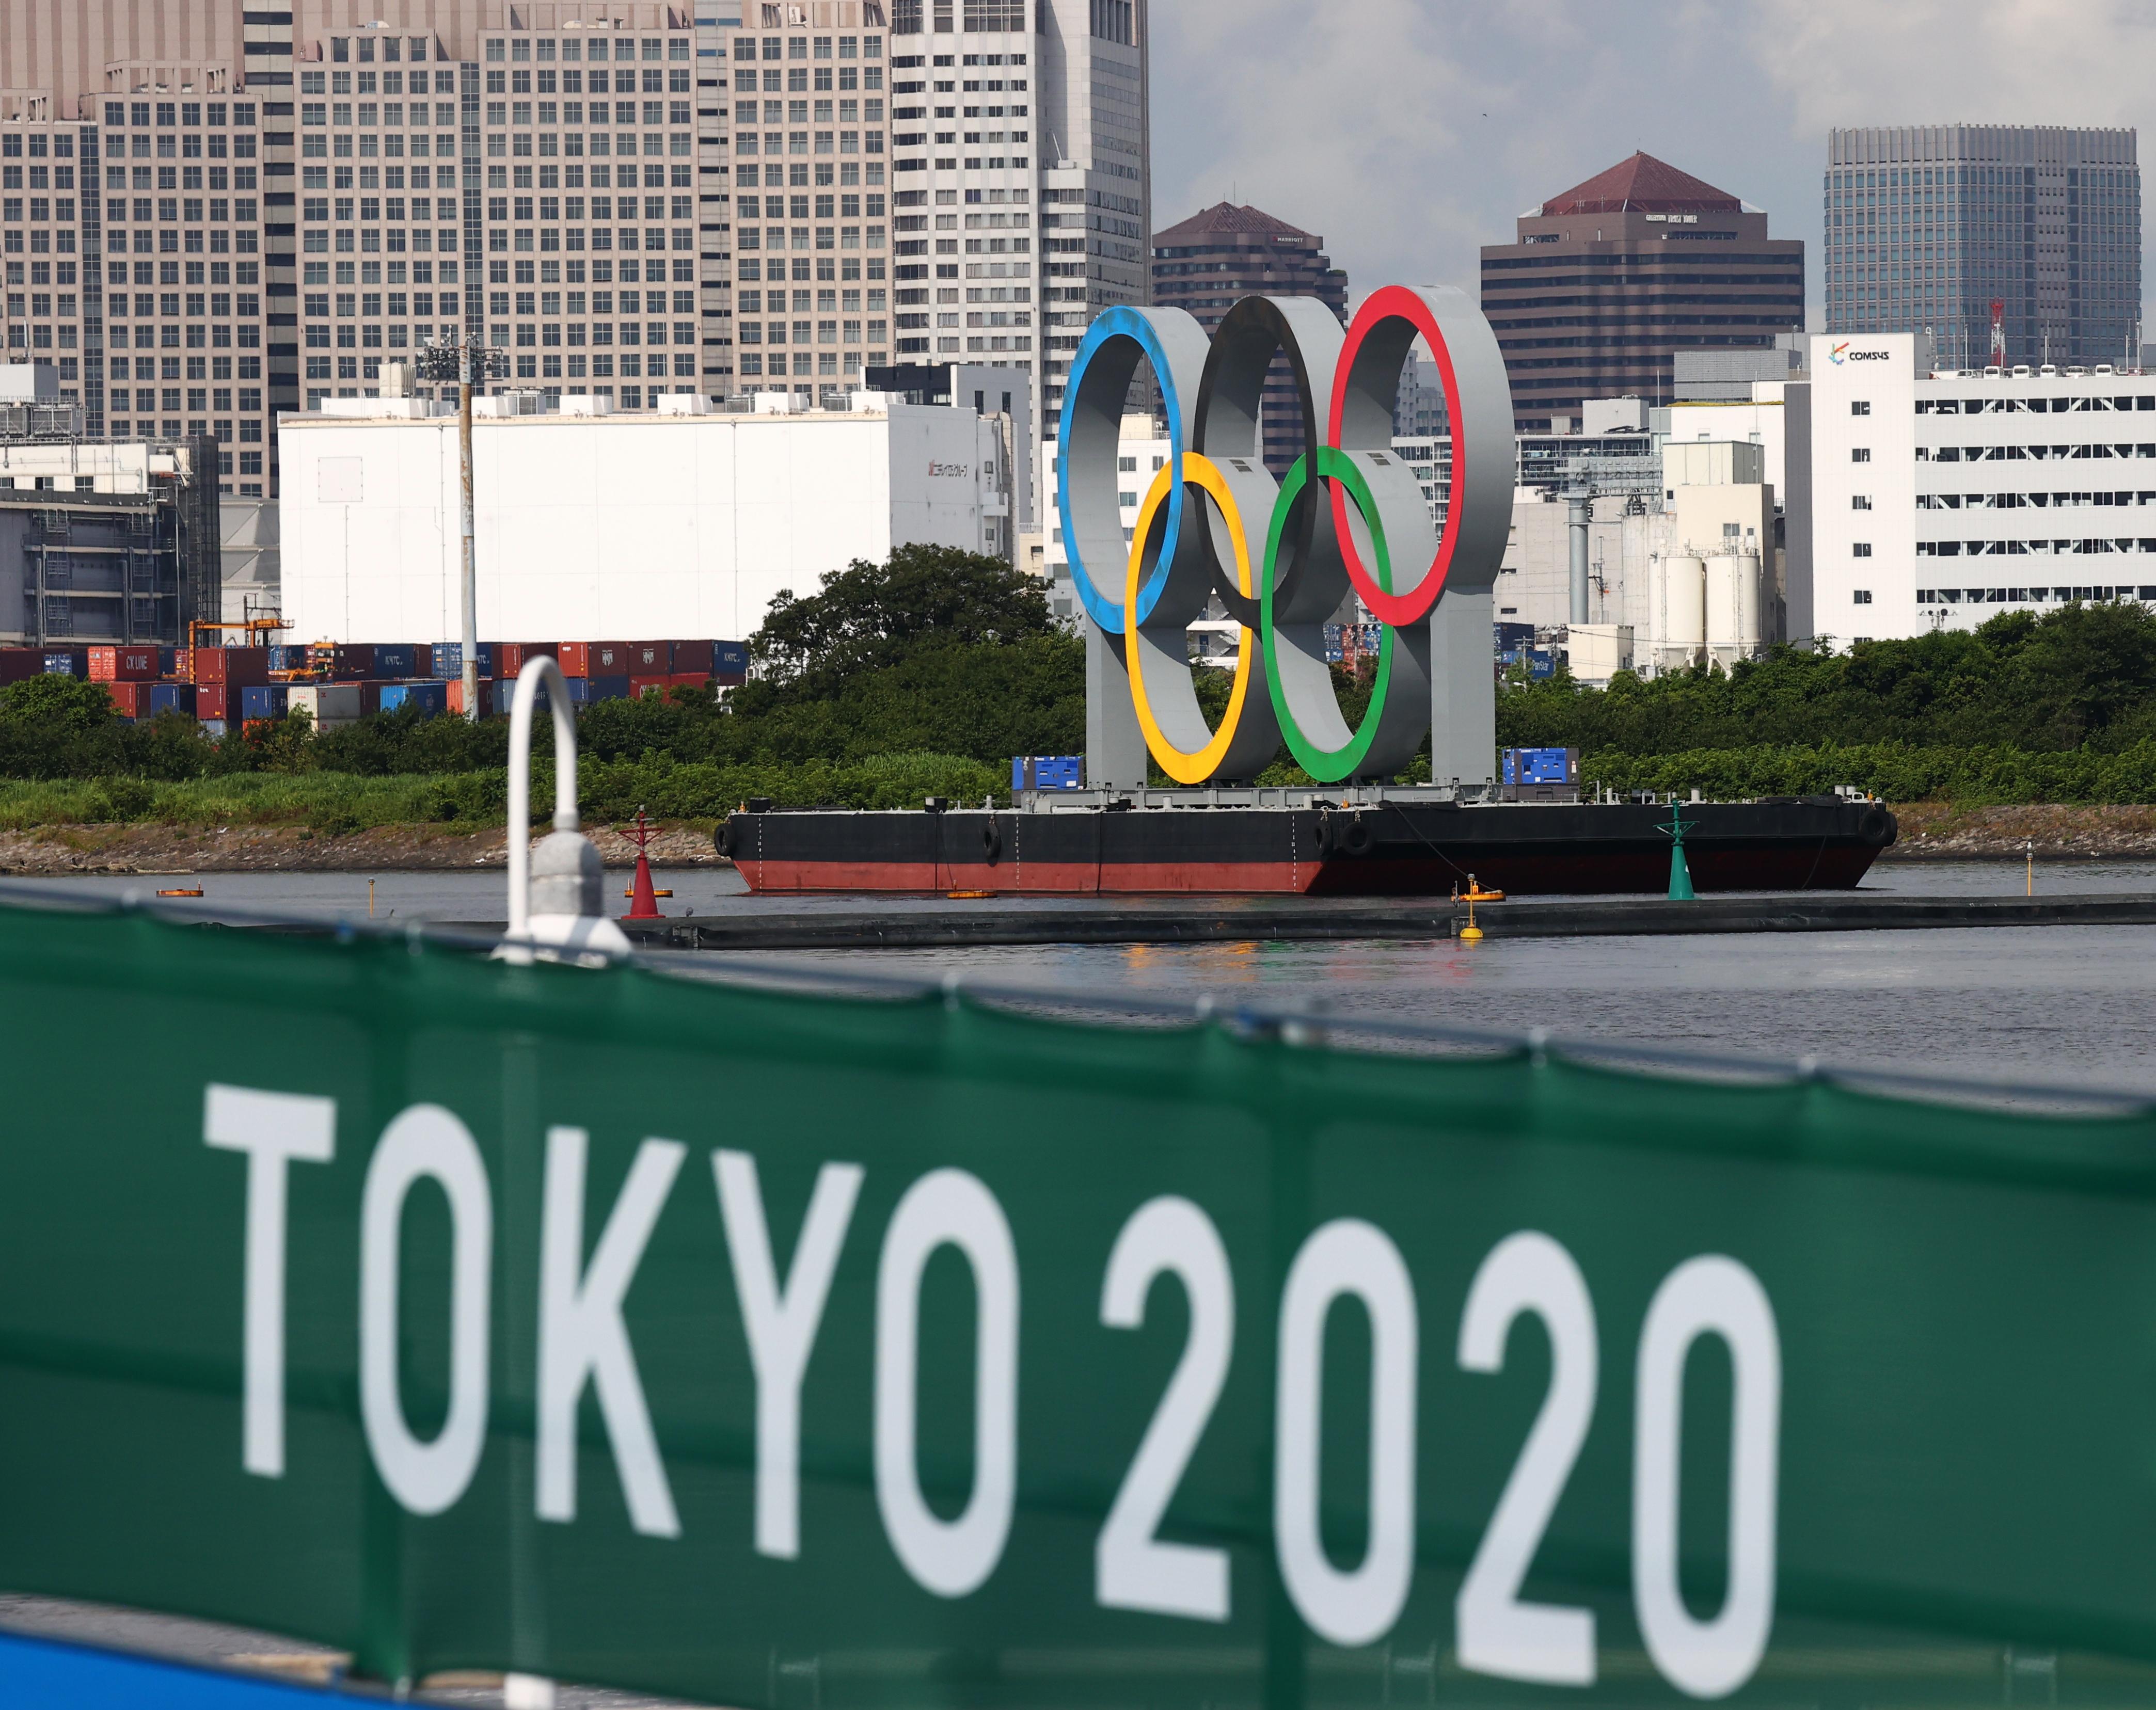 Tokyo 2020 Olympics - Triathlon - Mixed Team Relay - Final - Odaiba Marine Park, Tokyo, Japan - July 31, 2021. General view of olympic rings at Odaiba Marine Park REUTERS/Kacper Pempel